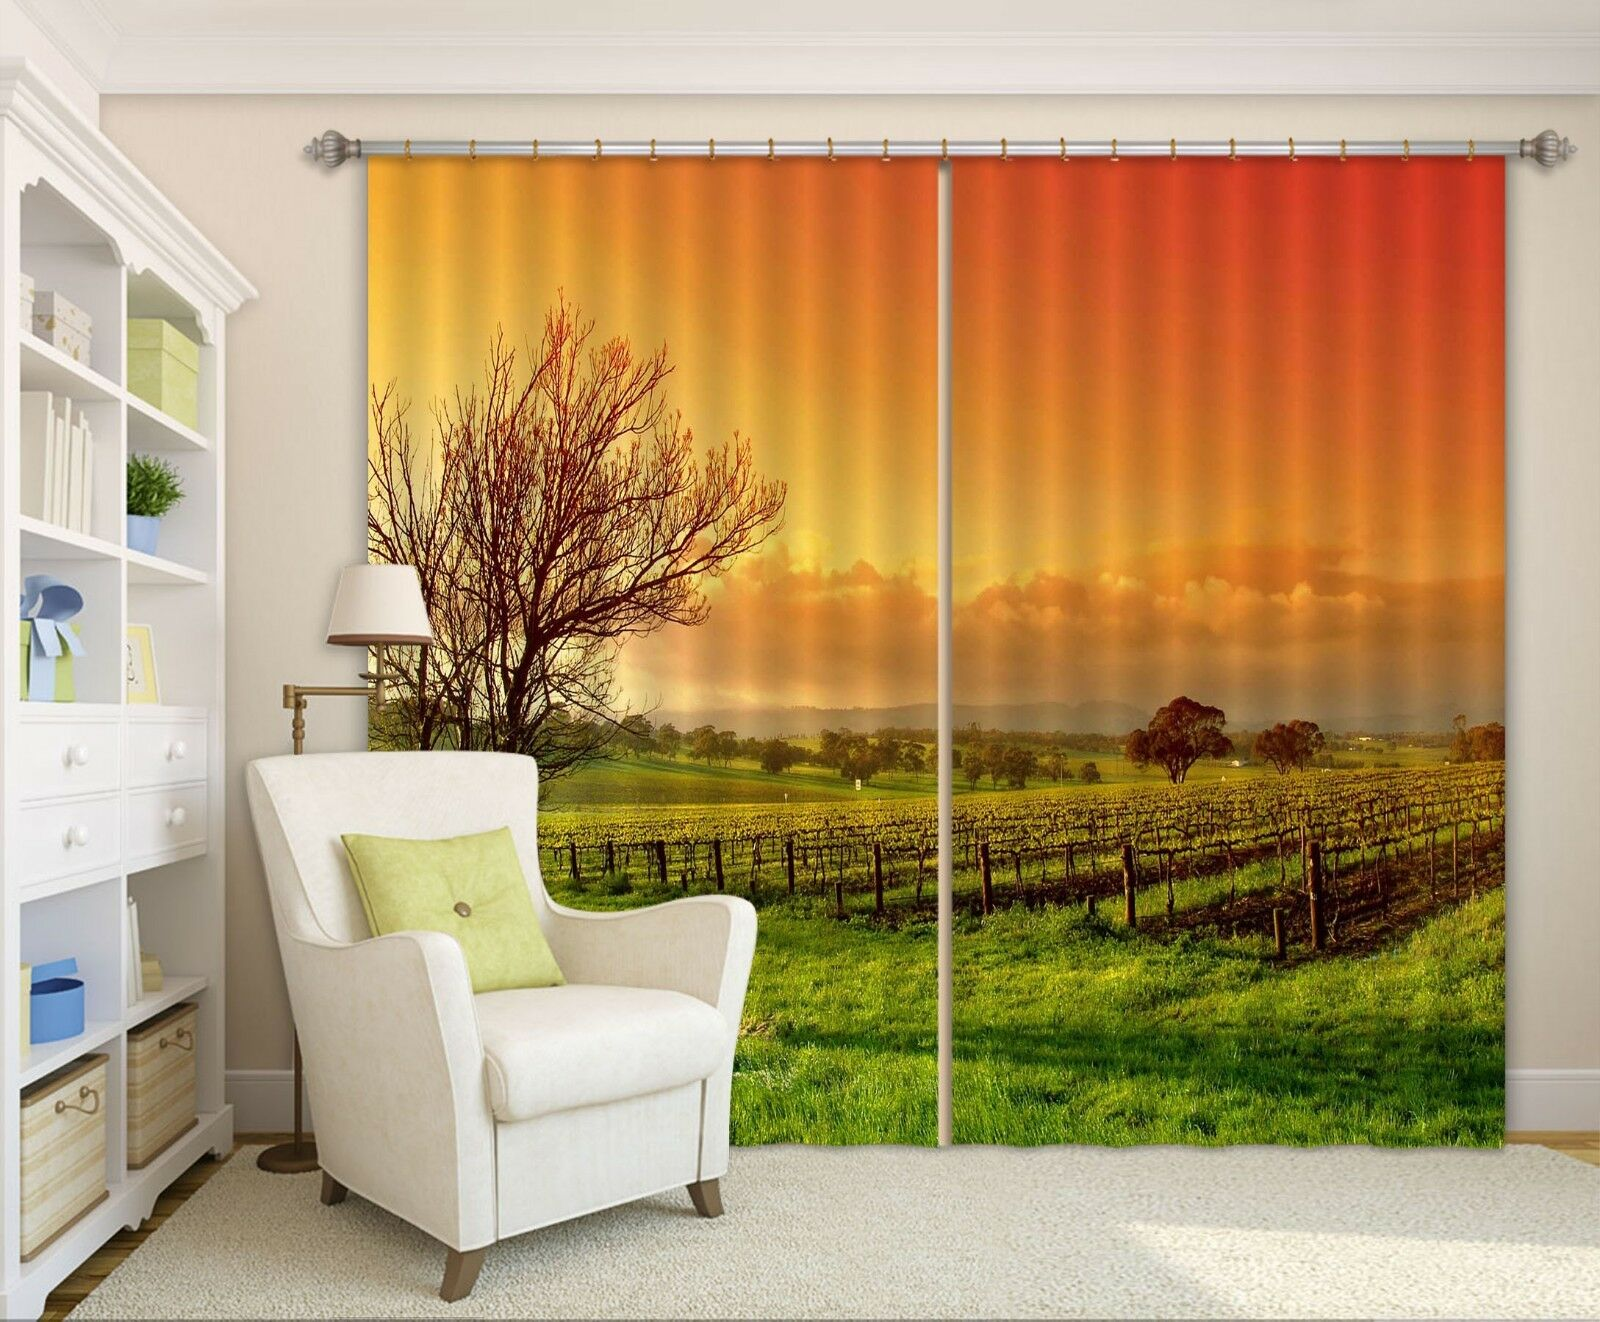 Campo 3D impresión fotográfica Sunset Blockout Cortinas Cortinas De Tela Cortina Ventana CA